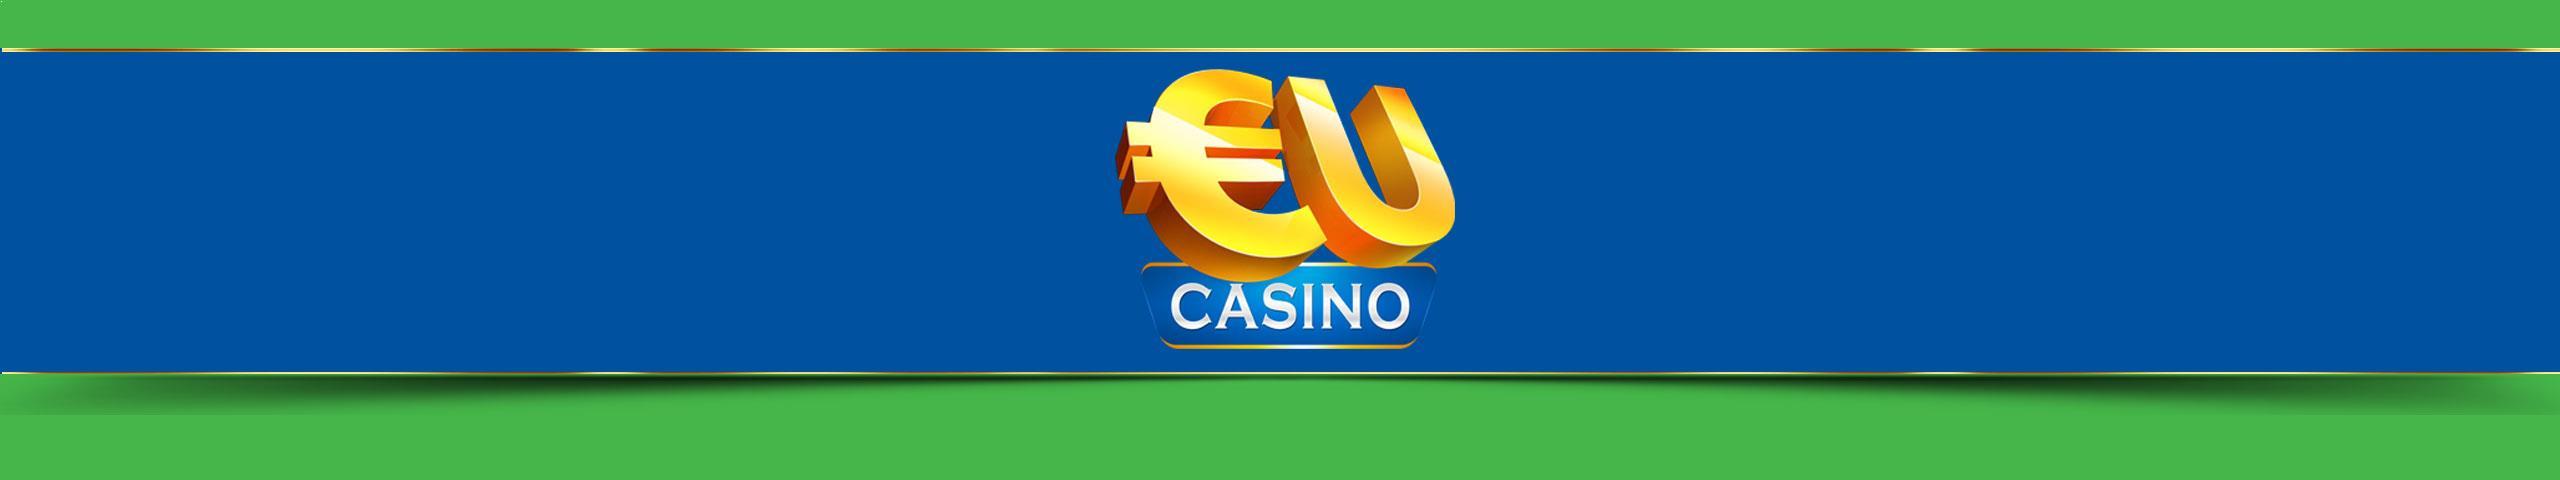 Eucasino Vizualizarea Casino-ului Multa Bafta Slider